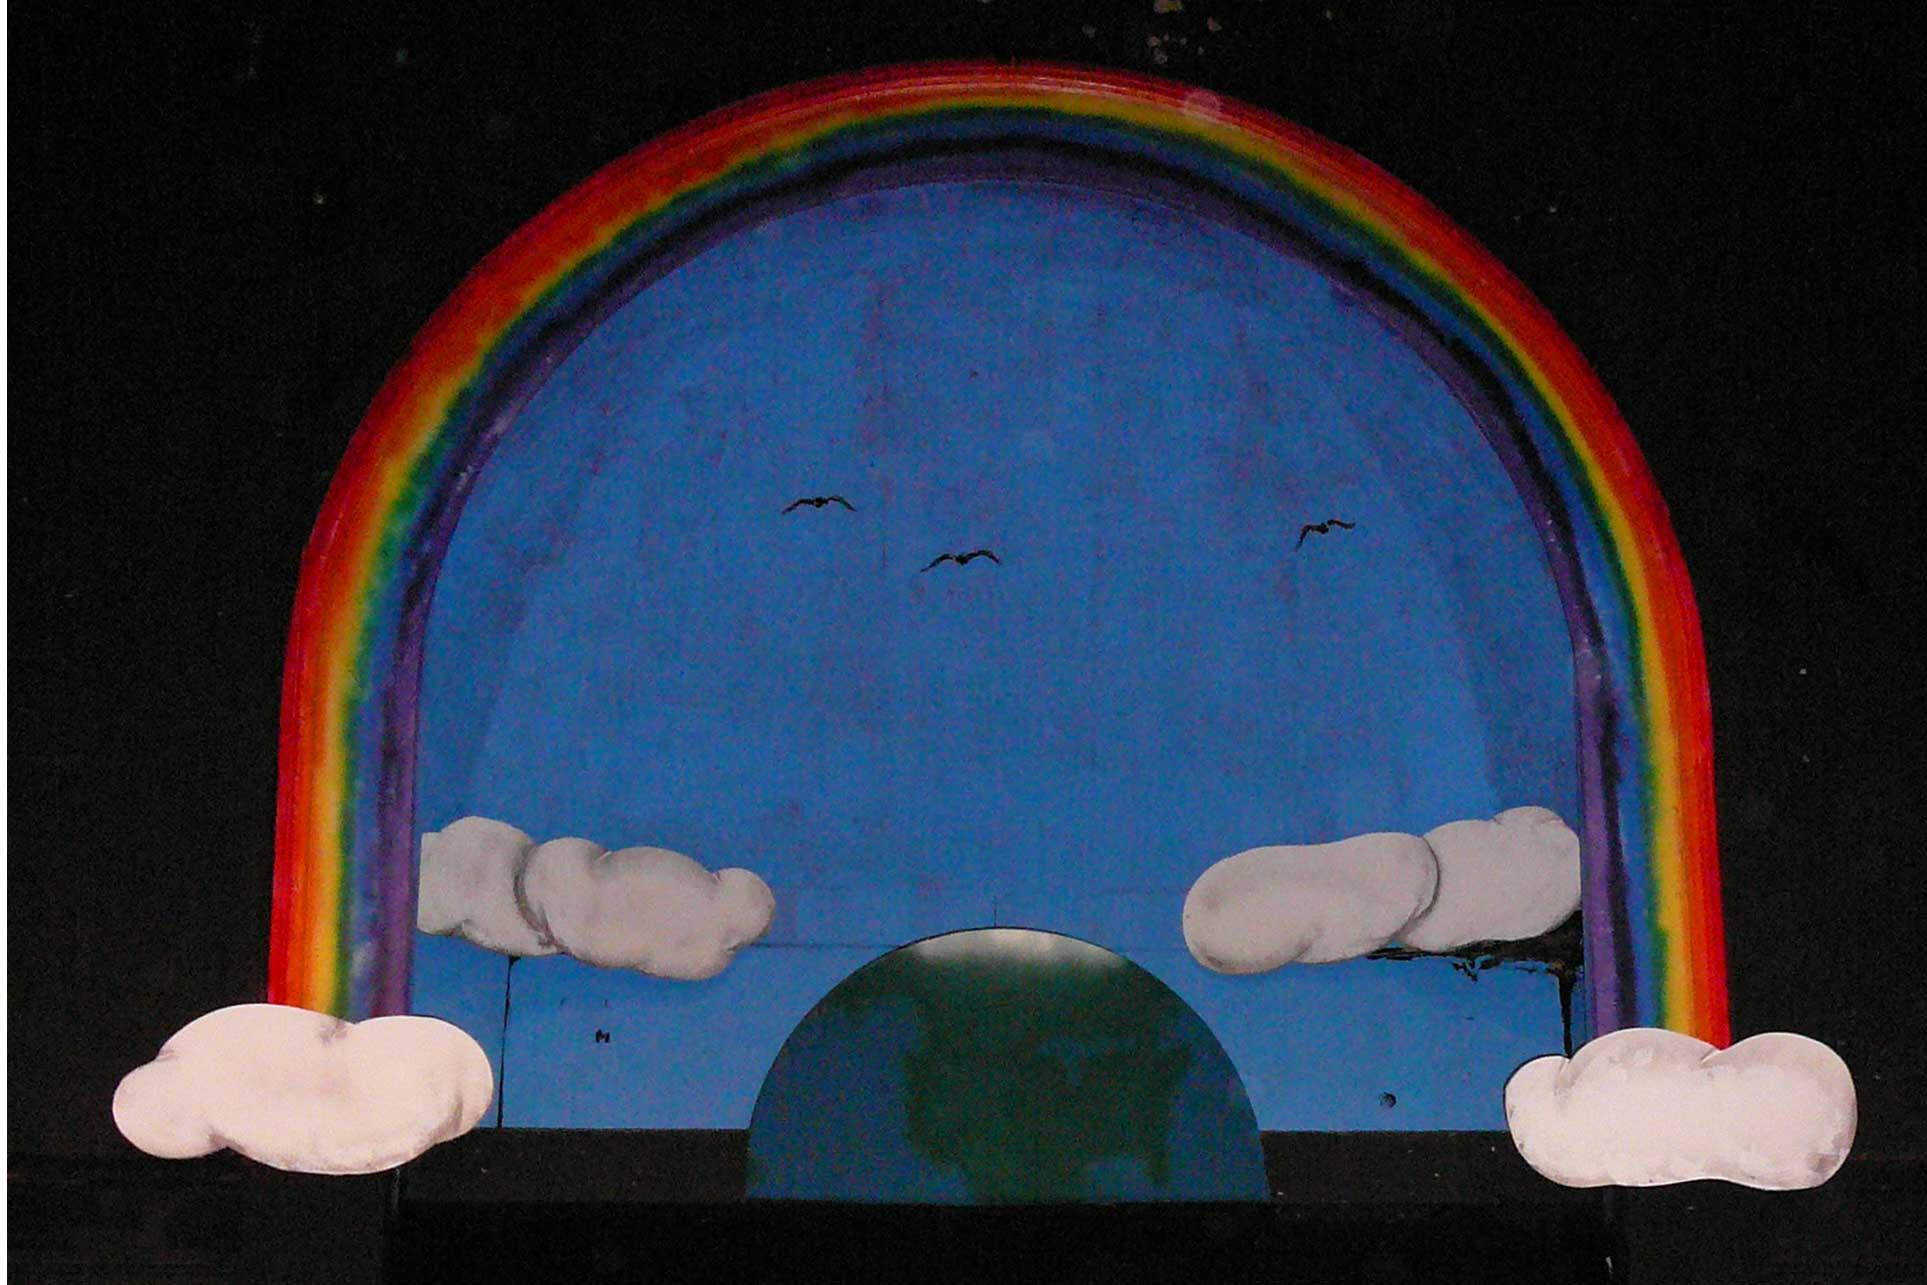 Rainbow backdrop